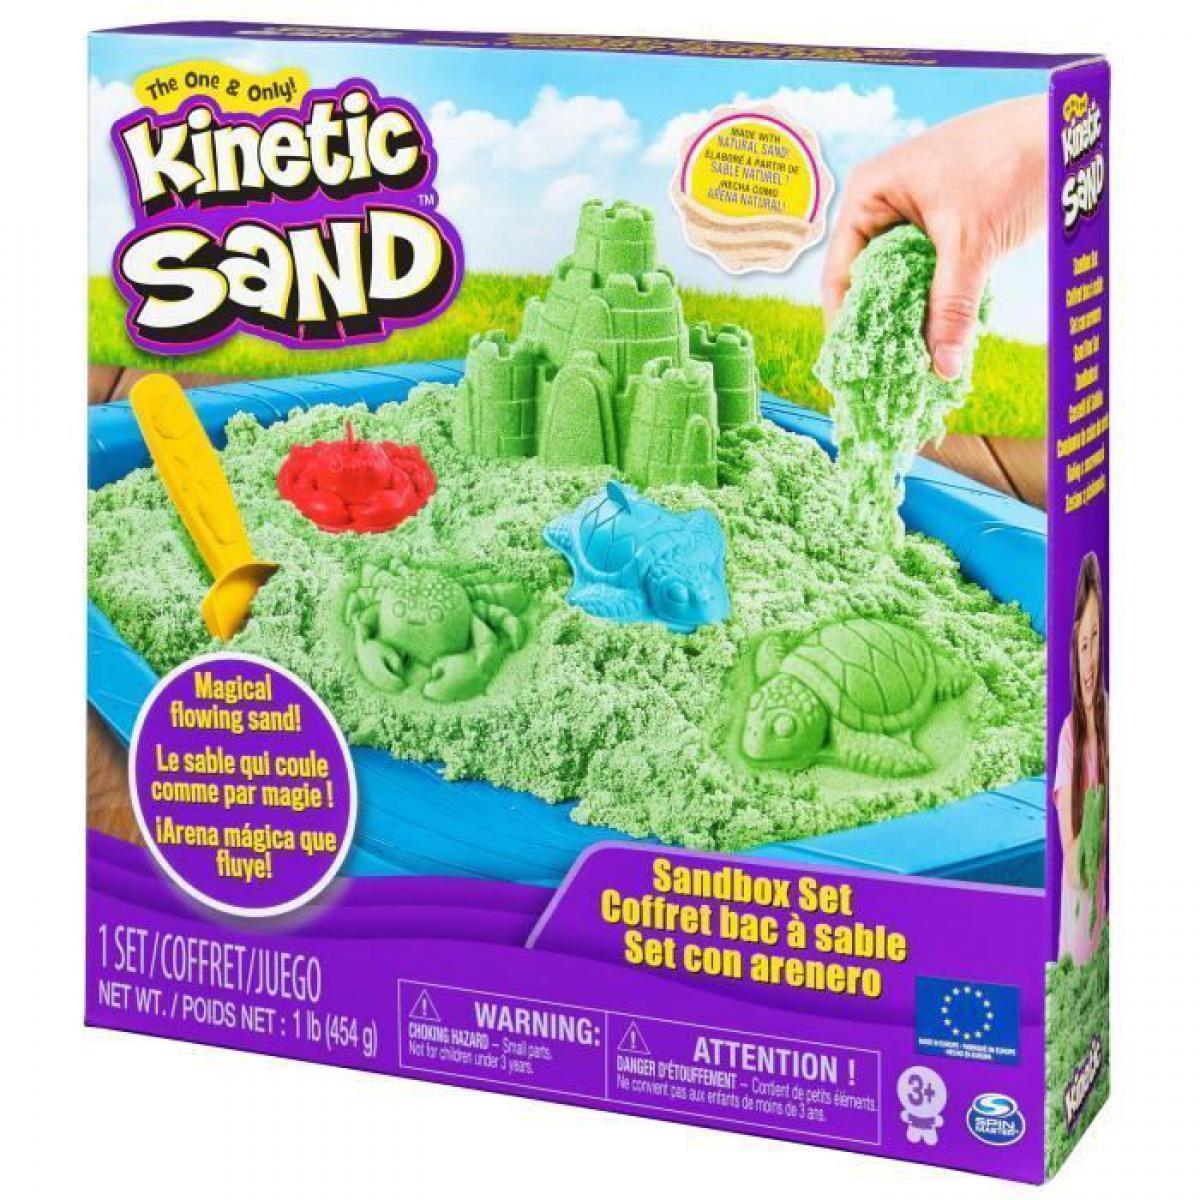 Kinetic Sand KINETIC SAND - Coffret Chateau Bac a sable 450g - Modele aleatoire